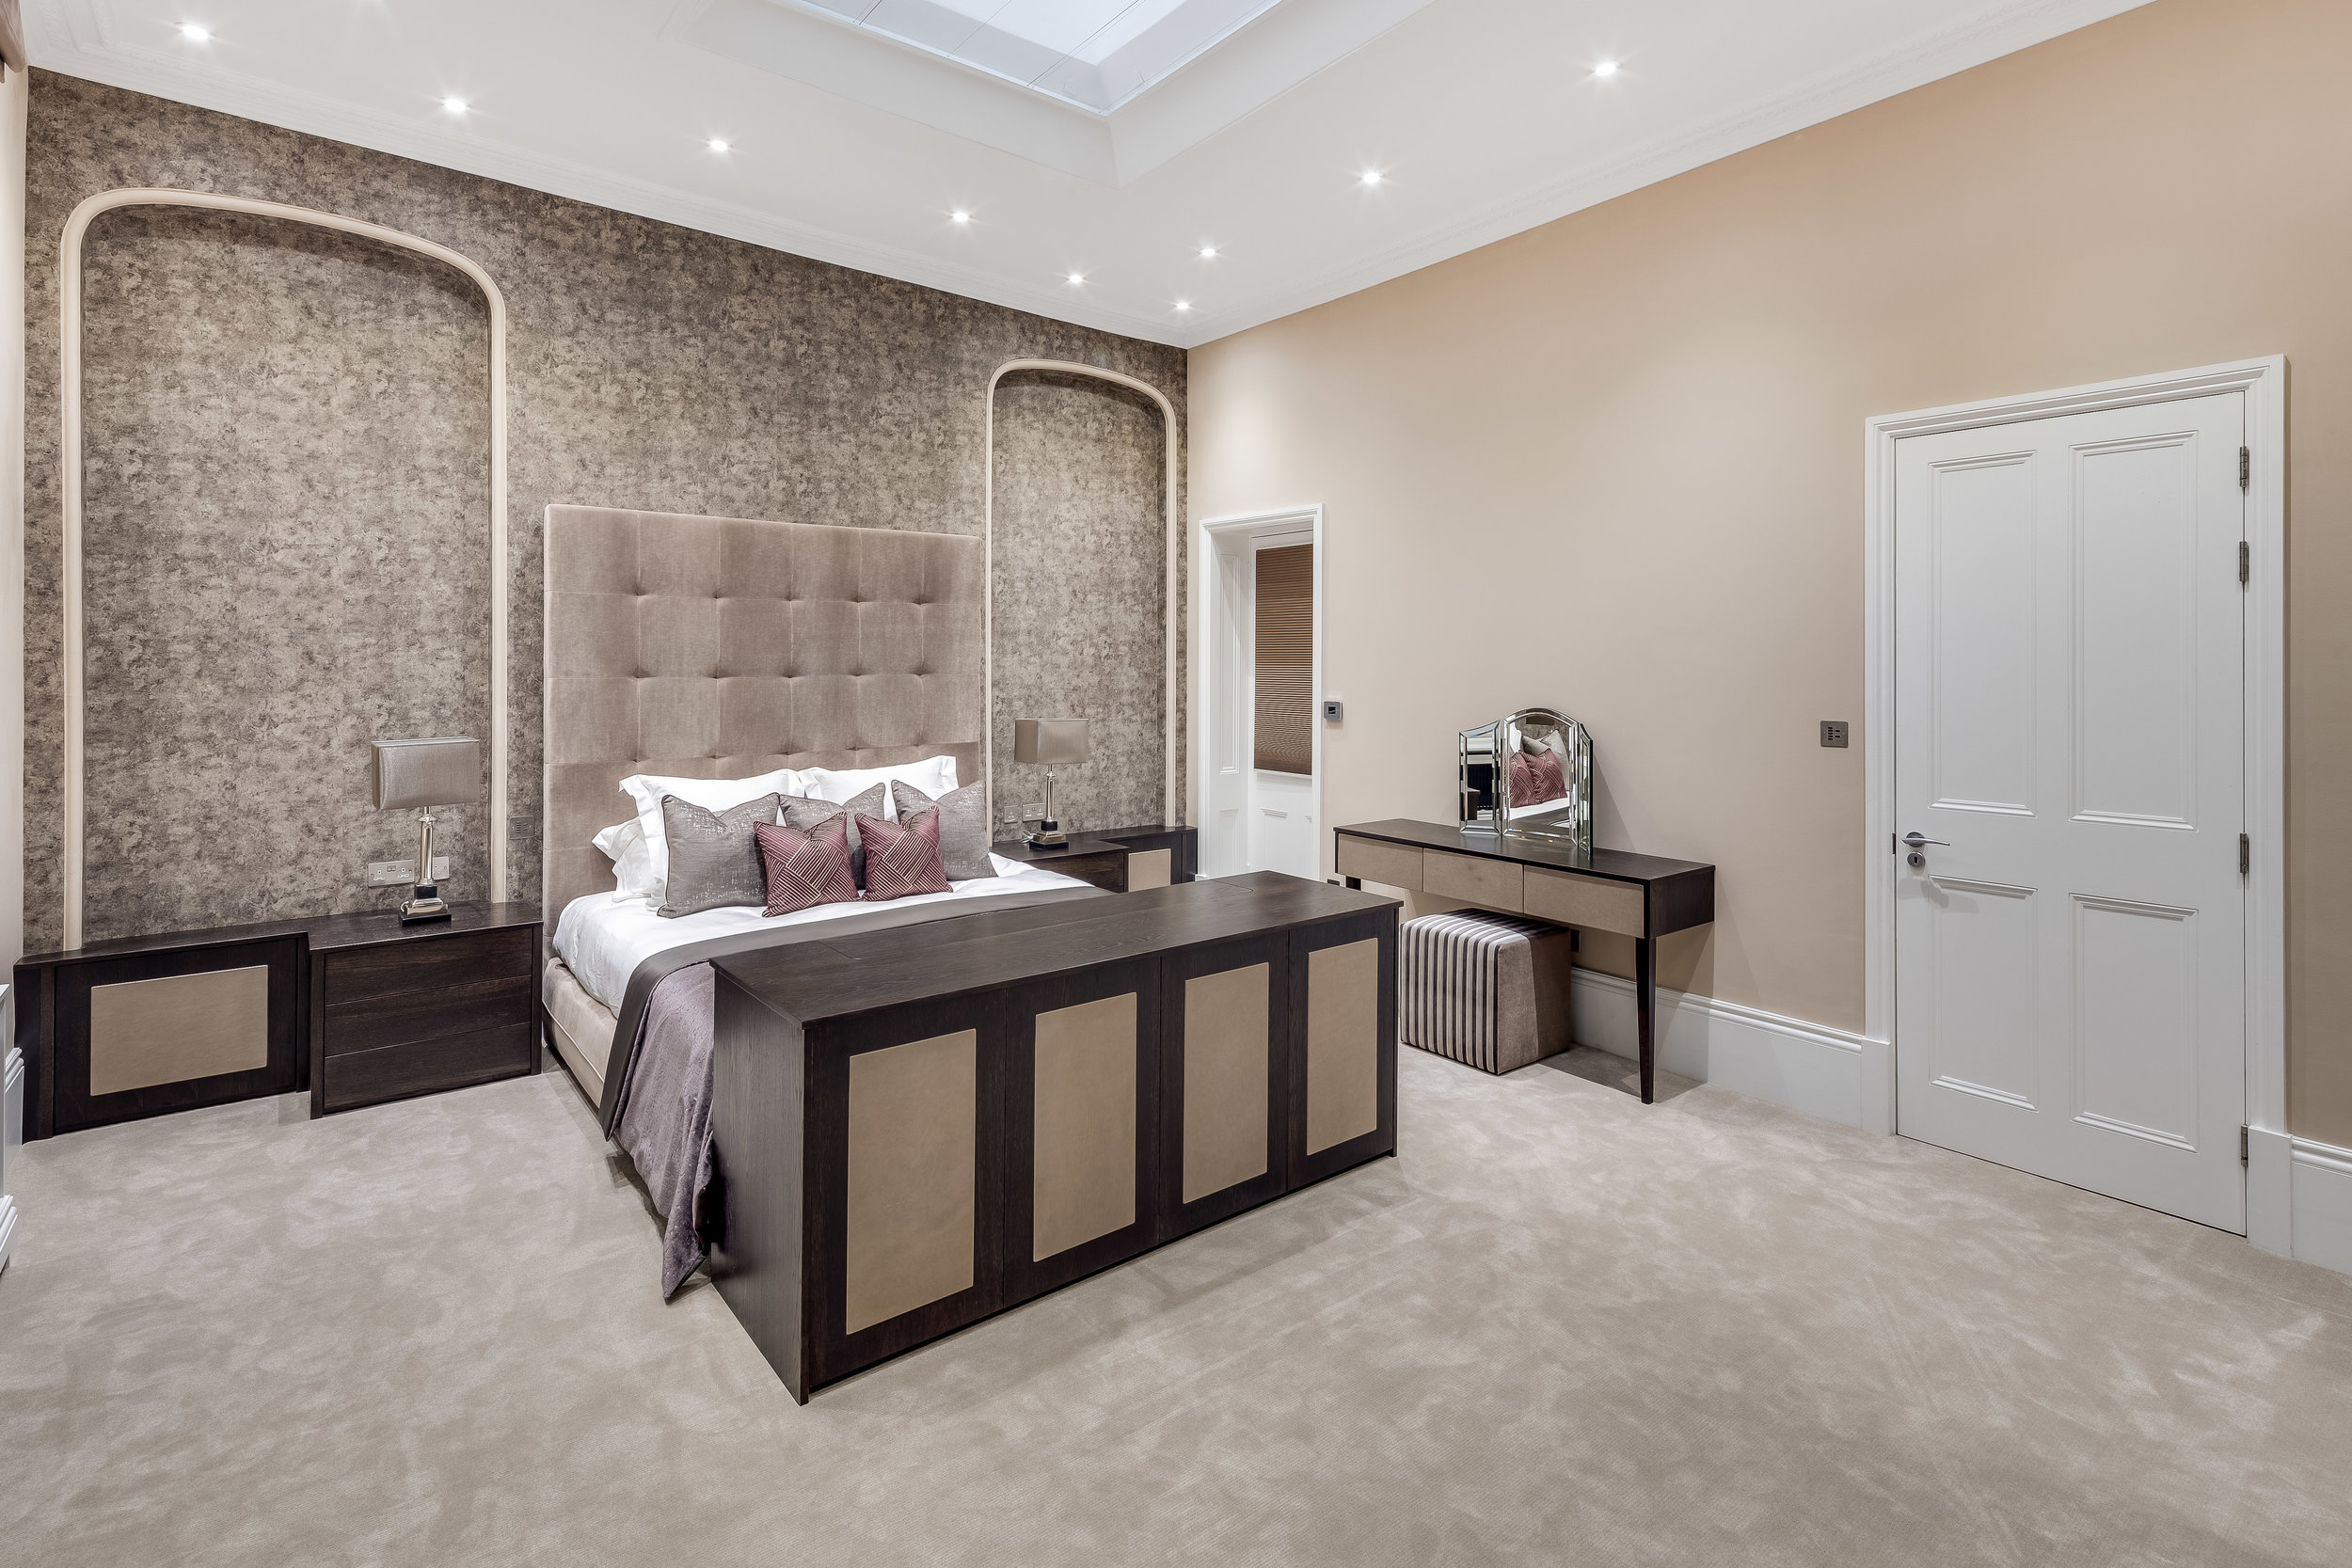 Primrose Interiors Kensington Bedroom 2-3.jpg